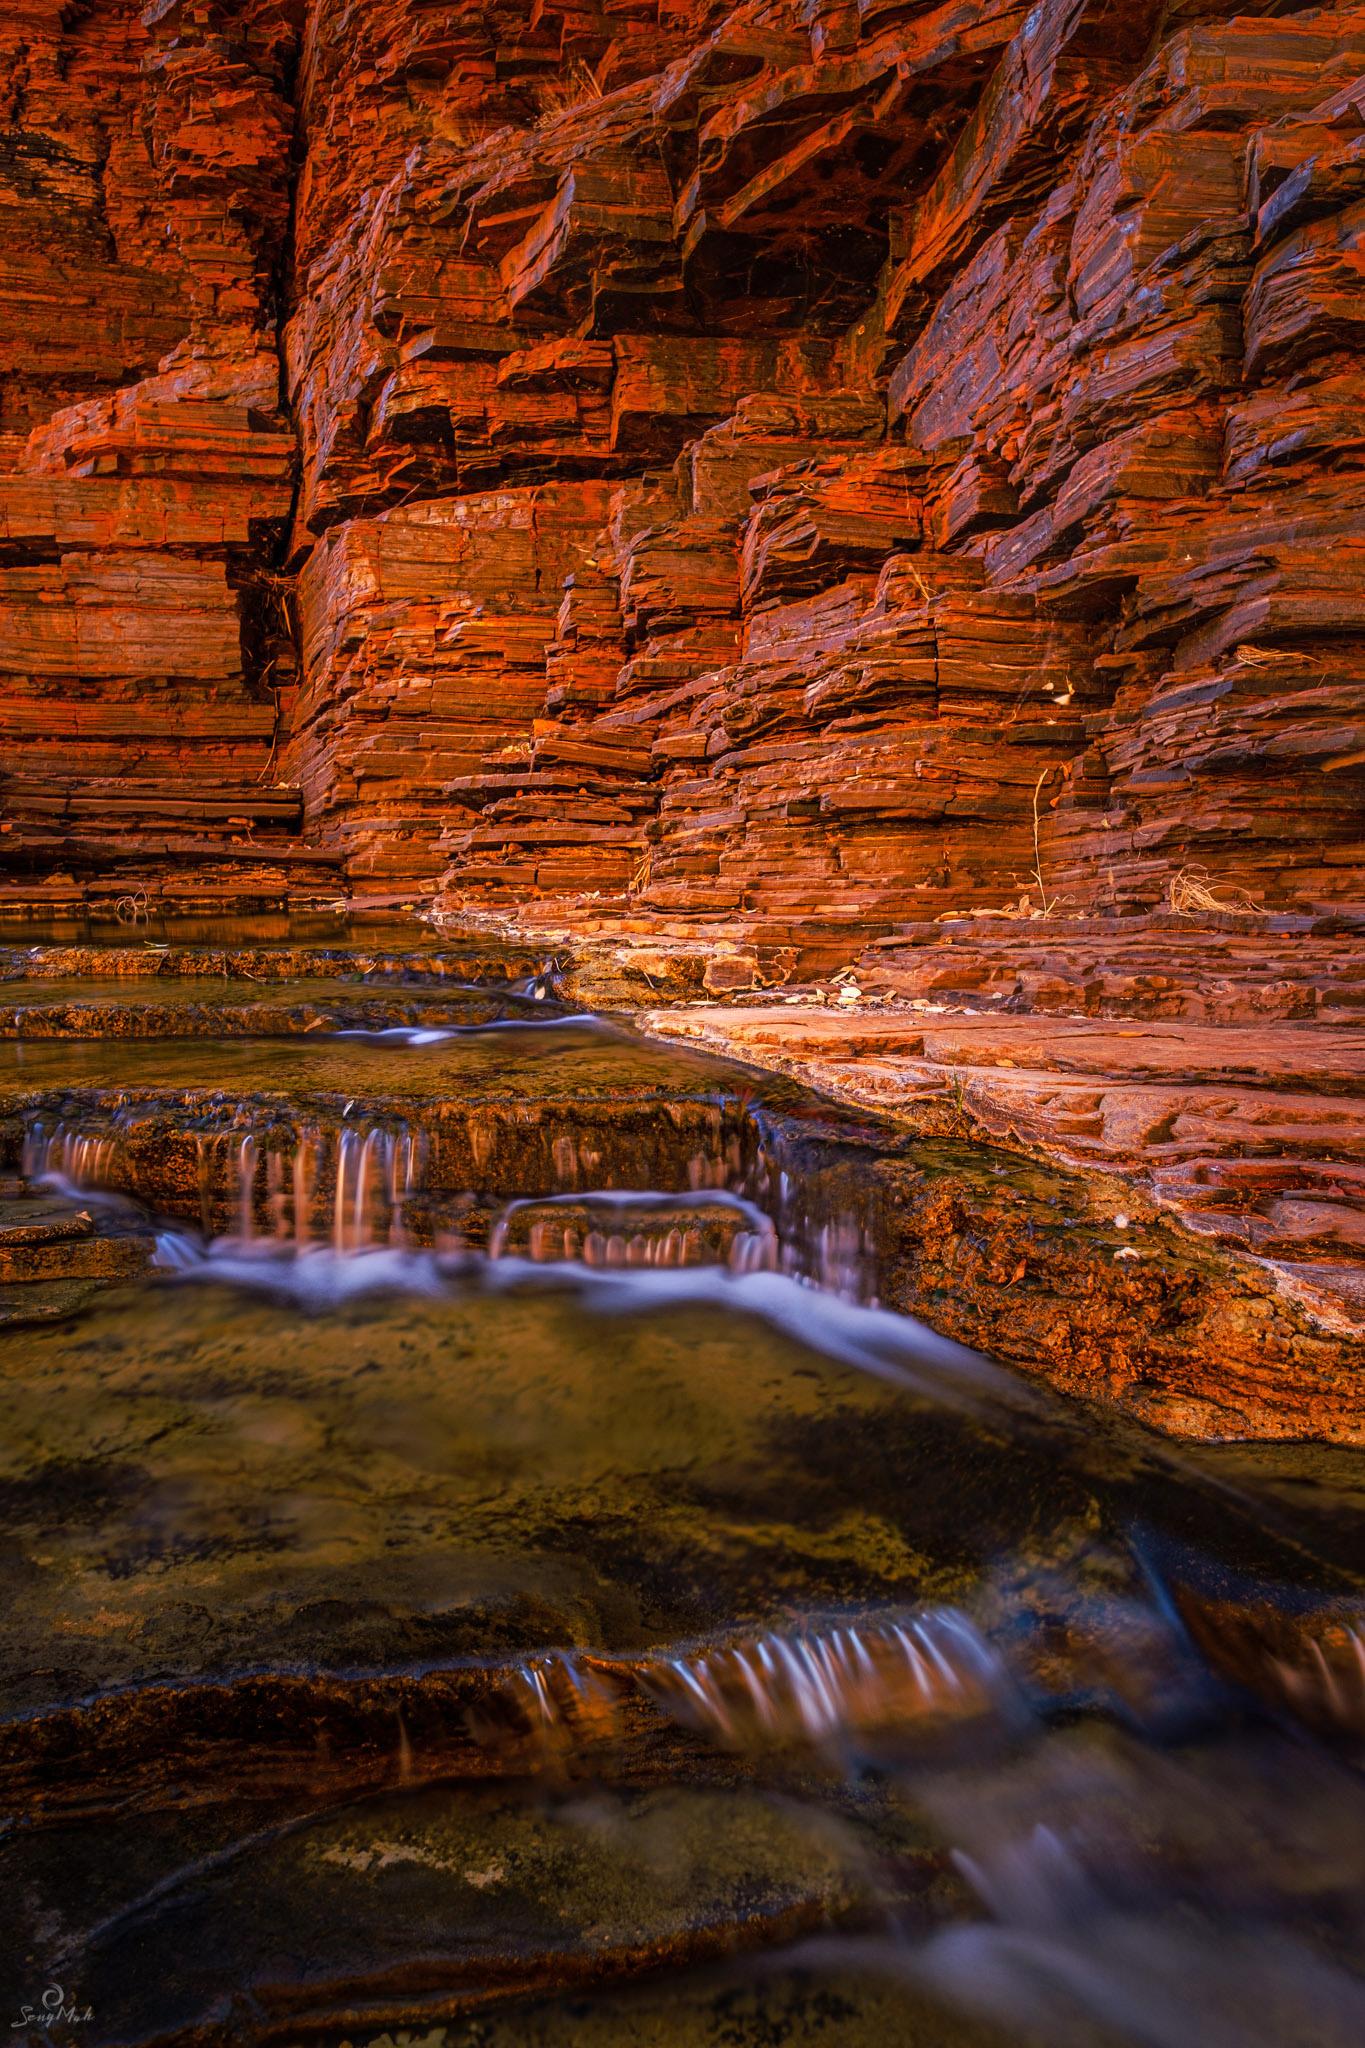 Kalaminia Gorge cascades